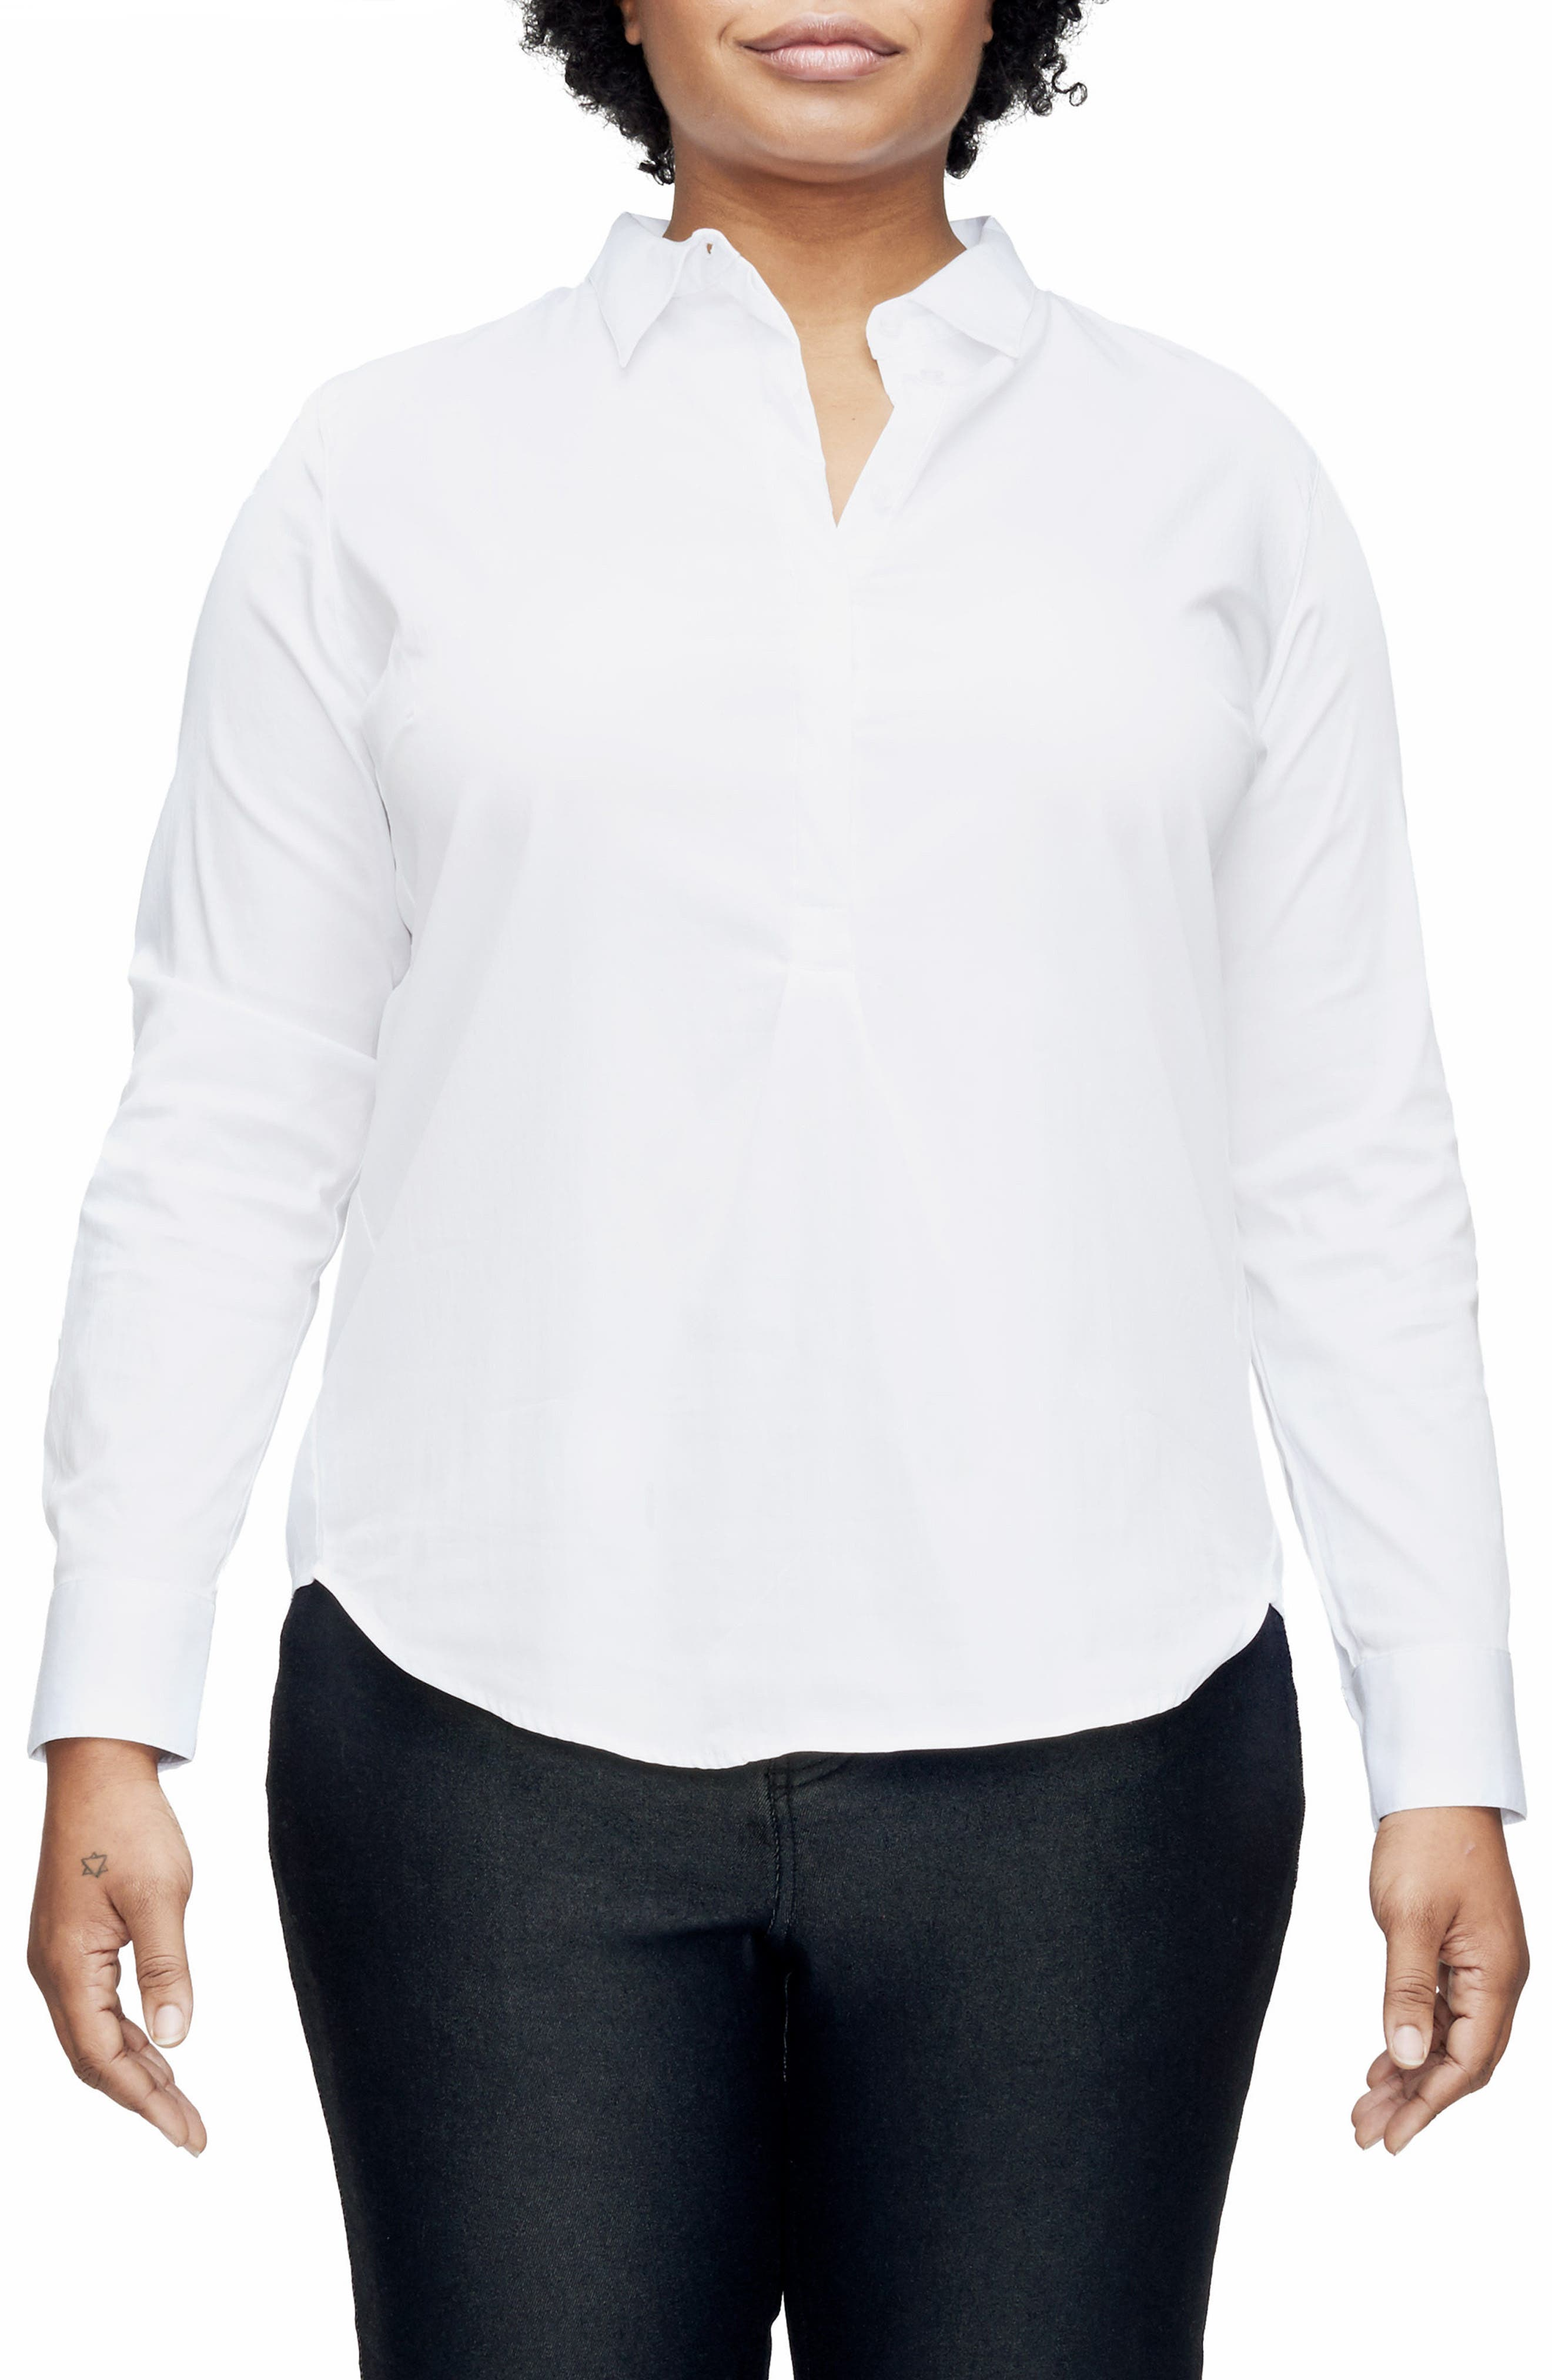 Elbe Shirt,                         Main,                         color, White